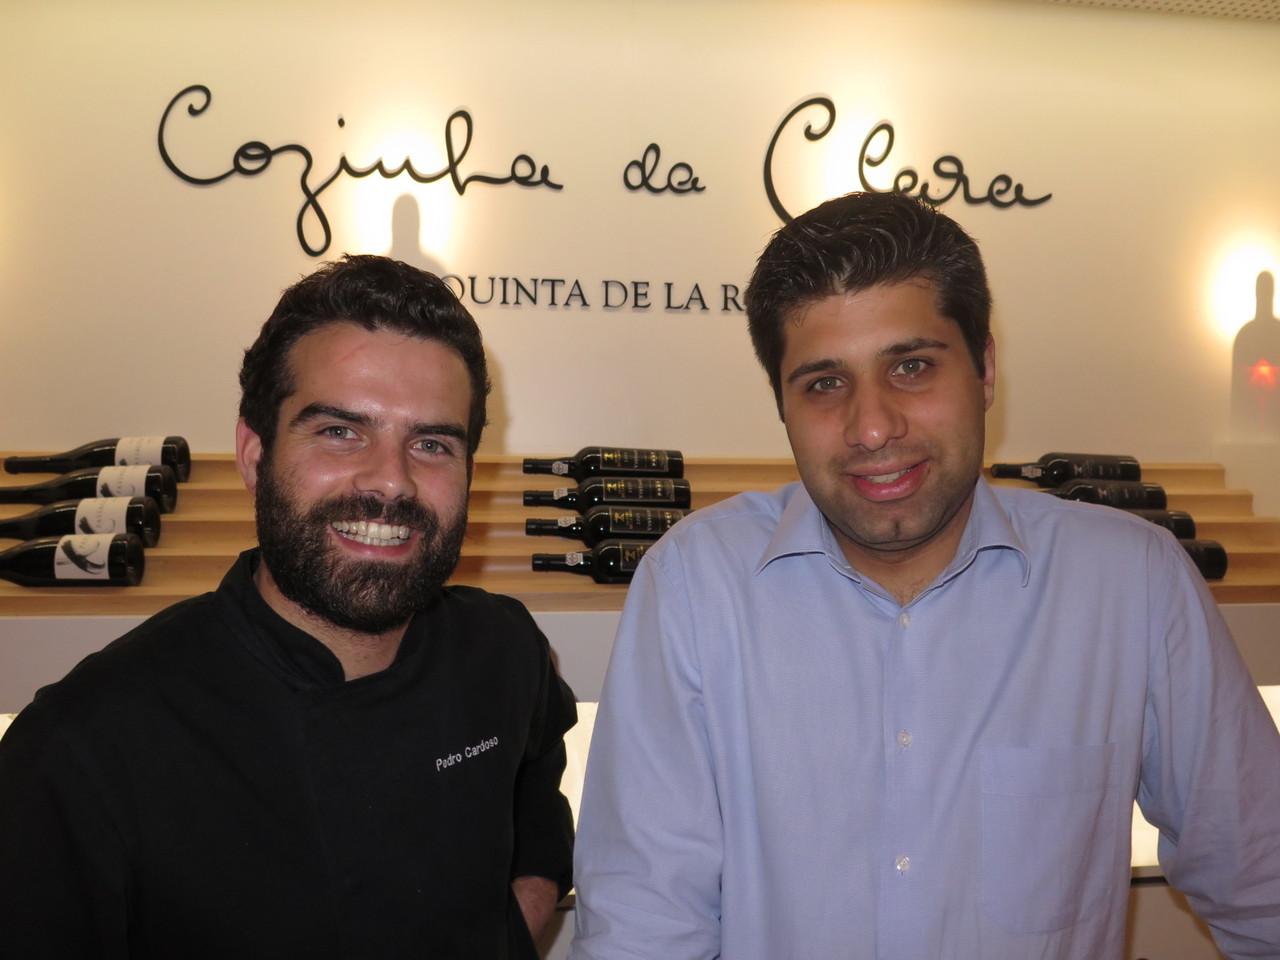 Pedro Cardoso e Pedro Esteves